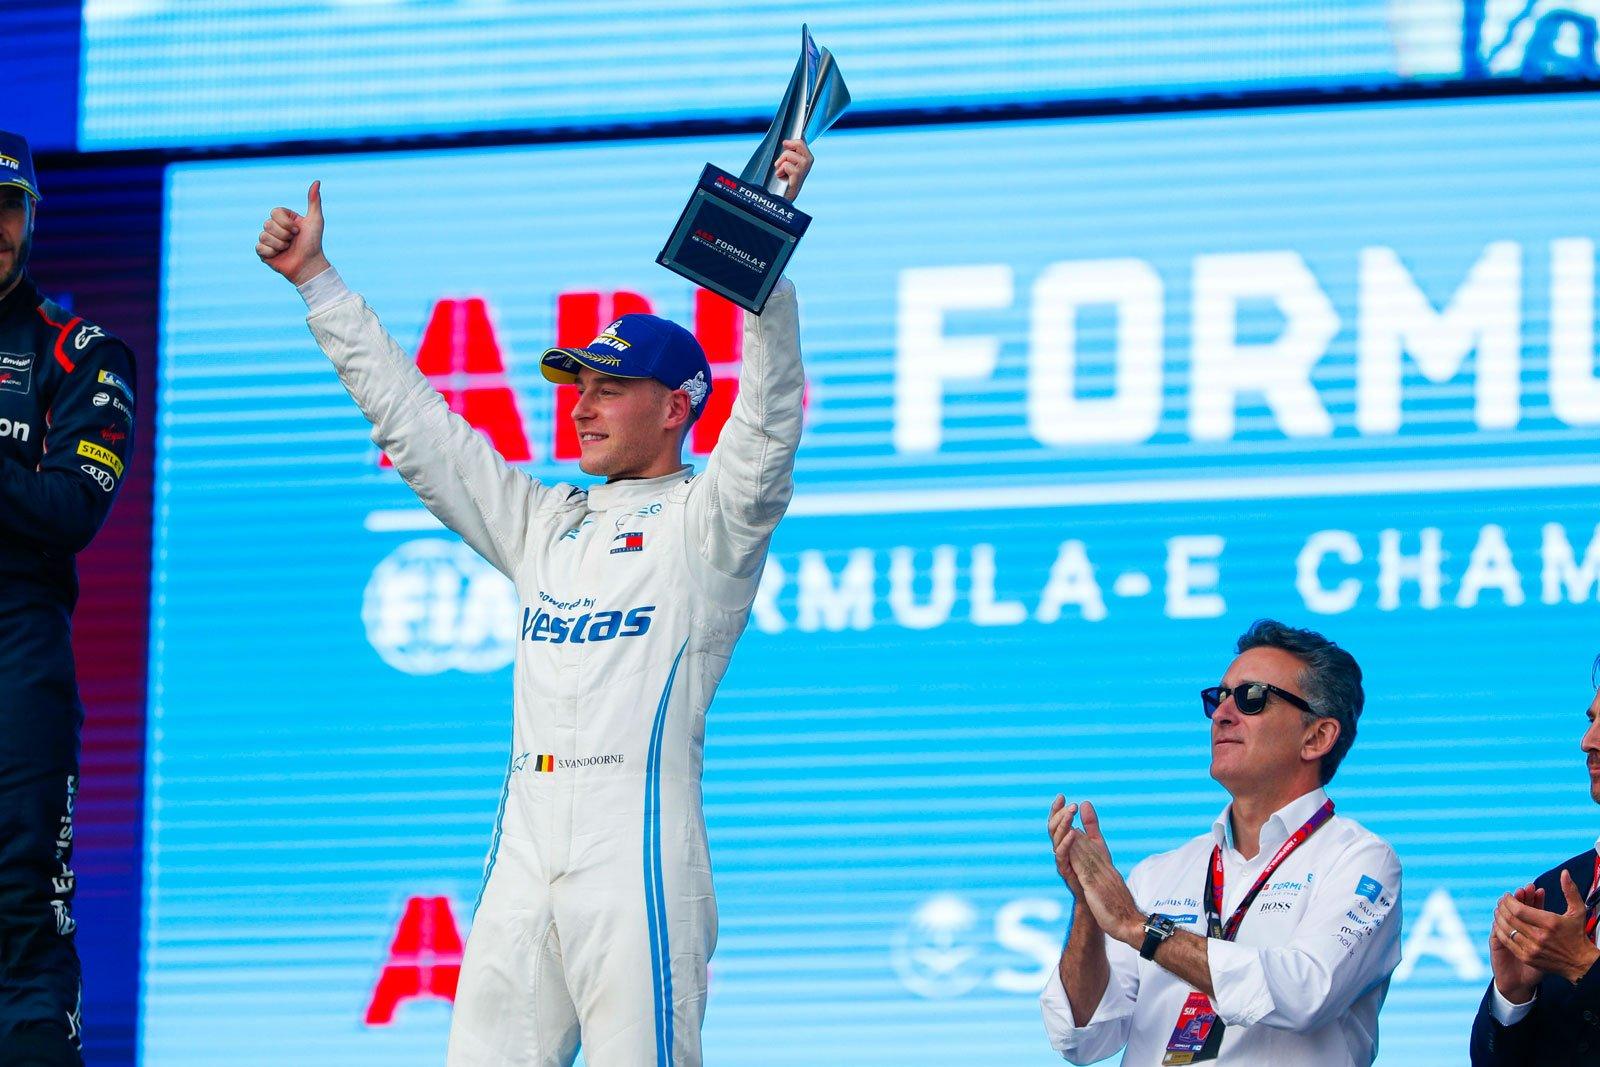 Formula E - Mercedes-Benz EQ Formula E Team, Diriyah E-Prix 2019. Stoffel Vandoorne.